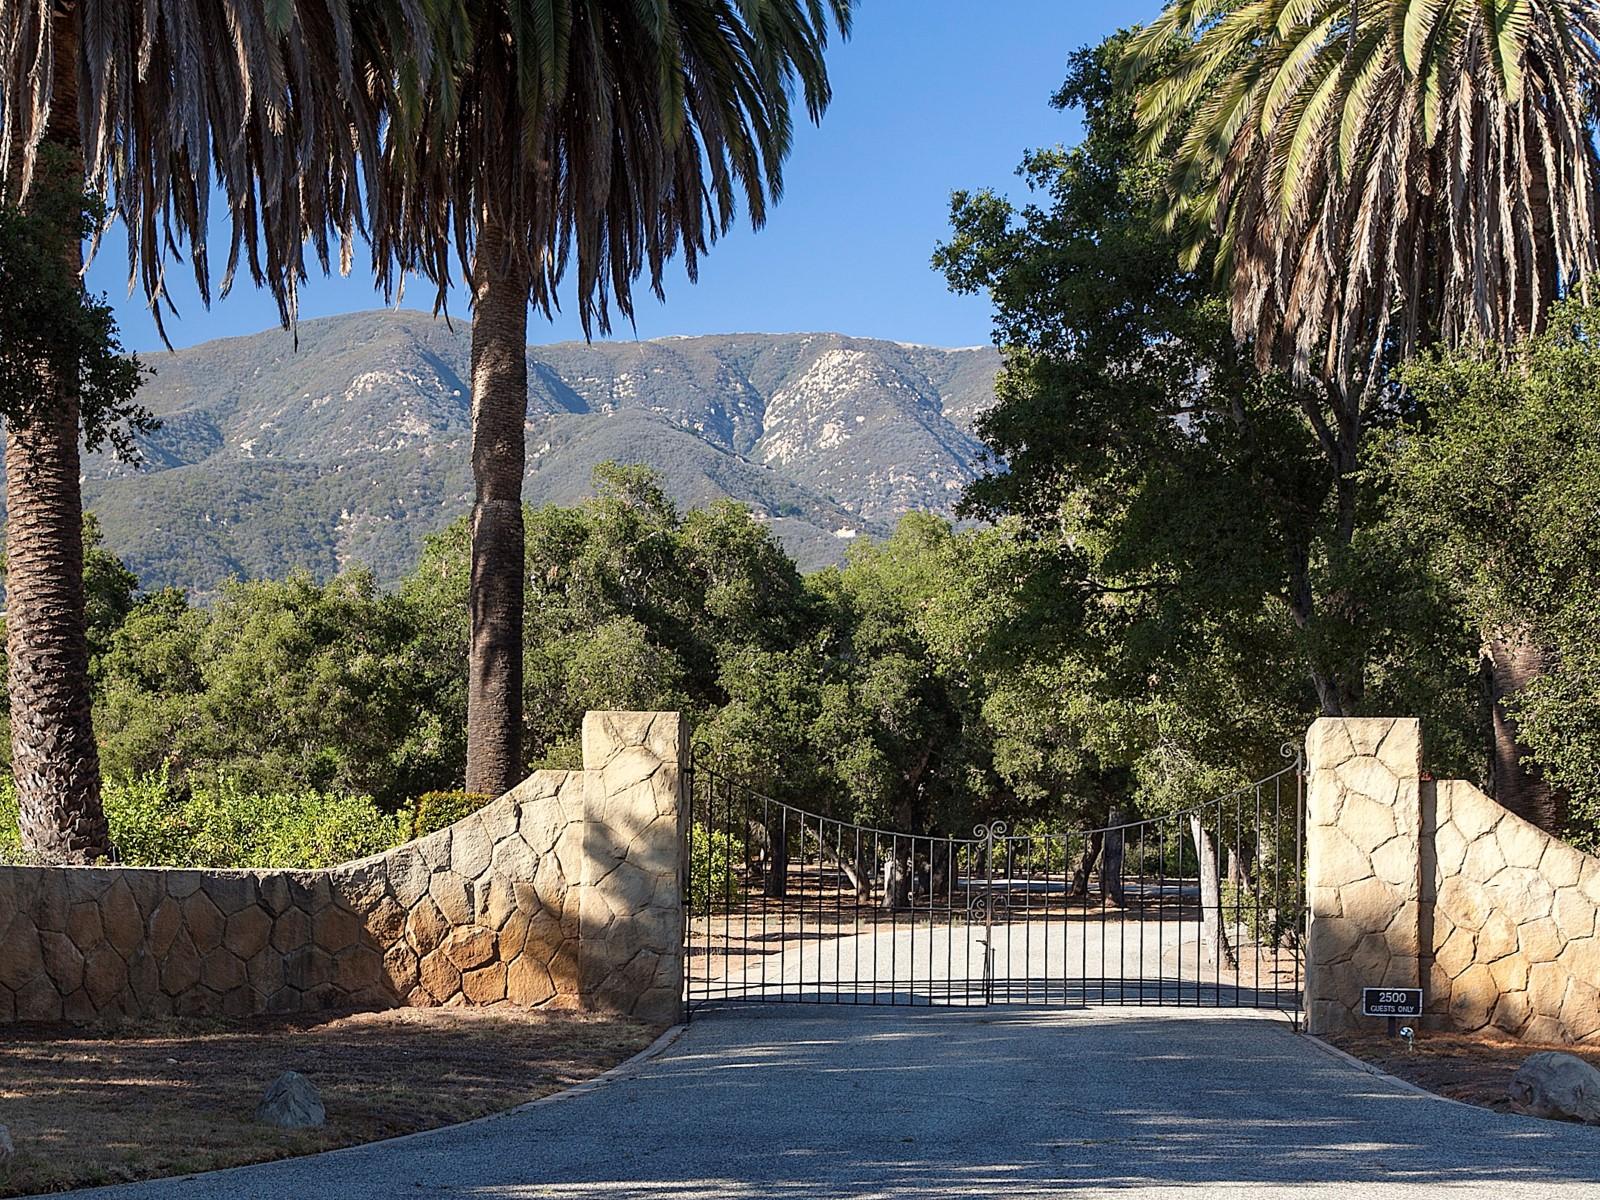 Rancho San Carlos, Montecito CA Single Family Home - Santa Barbara Real Estate